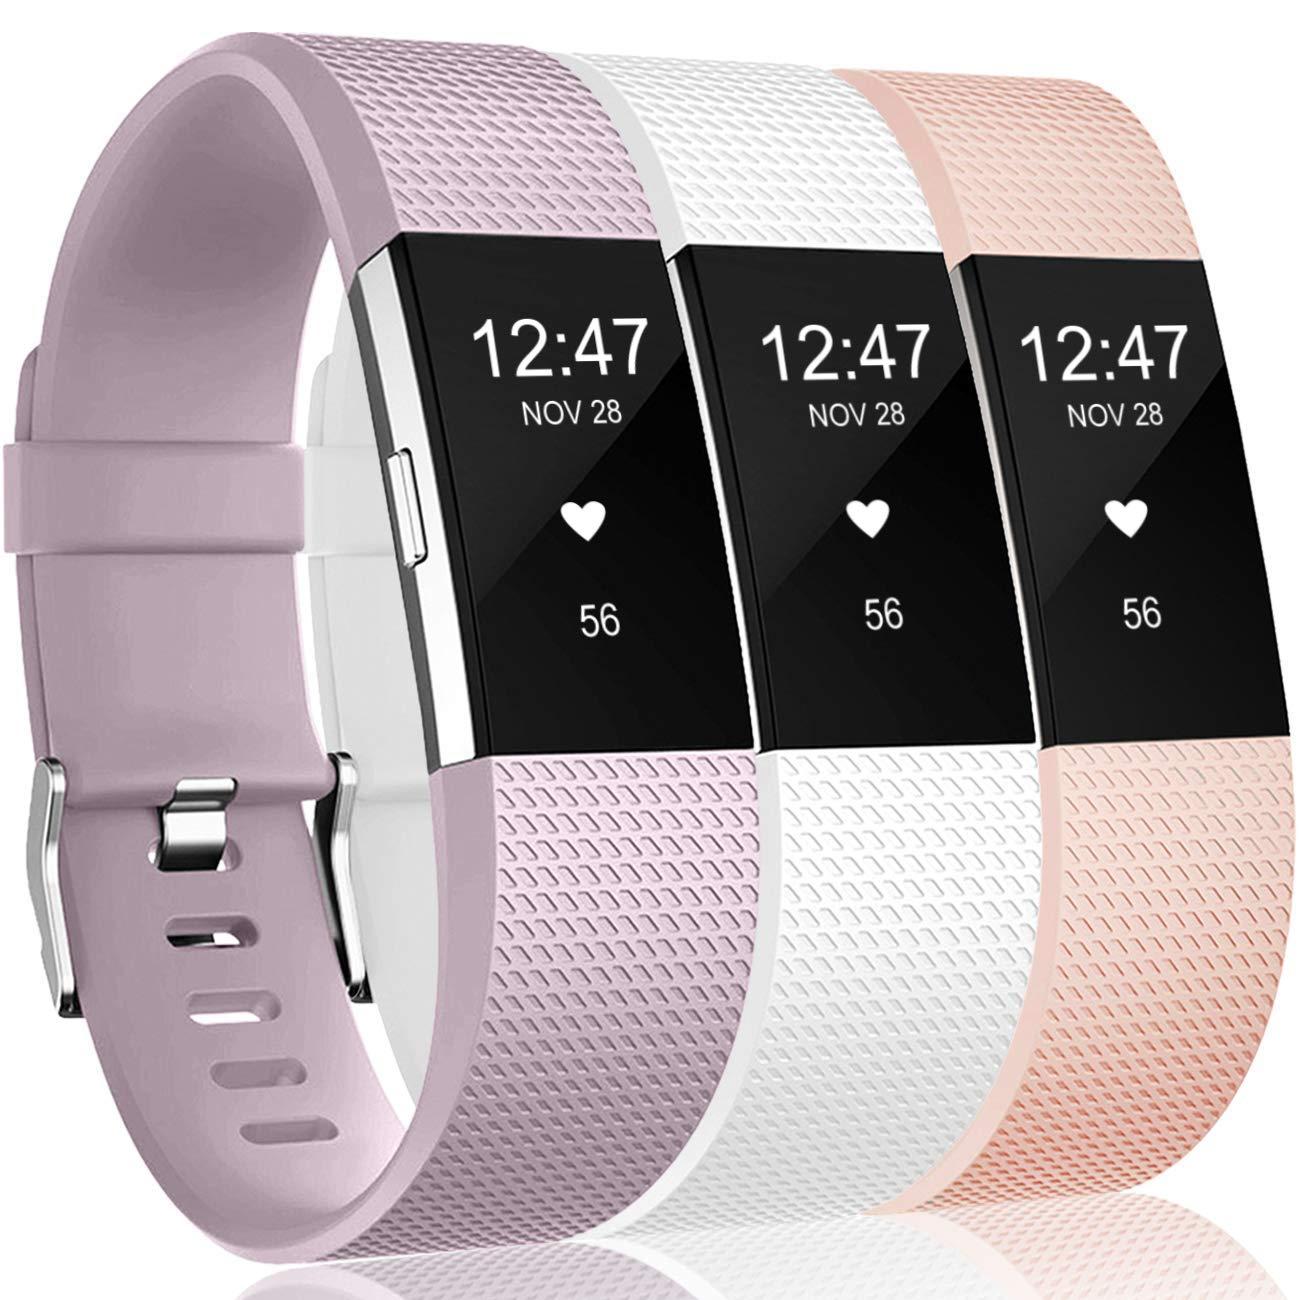 Mallas Para Reloj Fitbit Charge 2 Hr (3 Unidades)